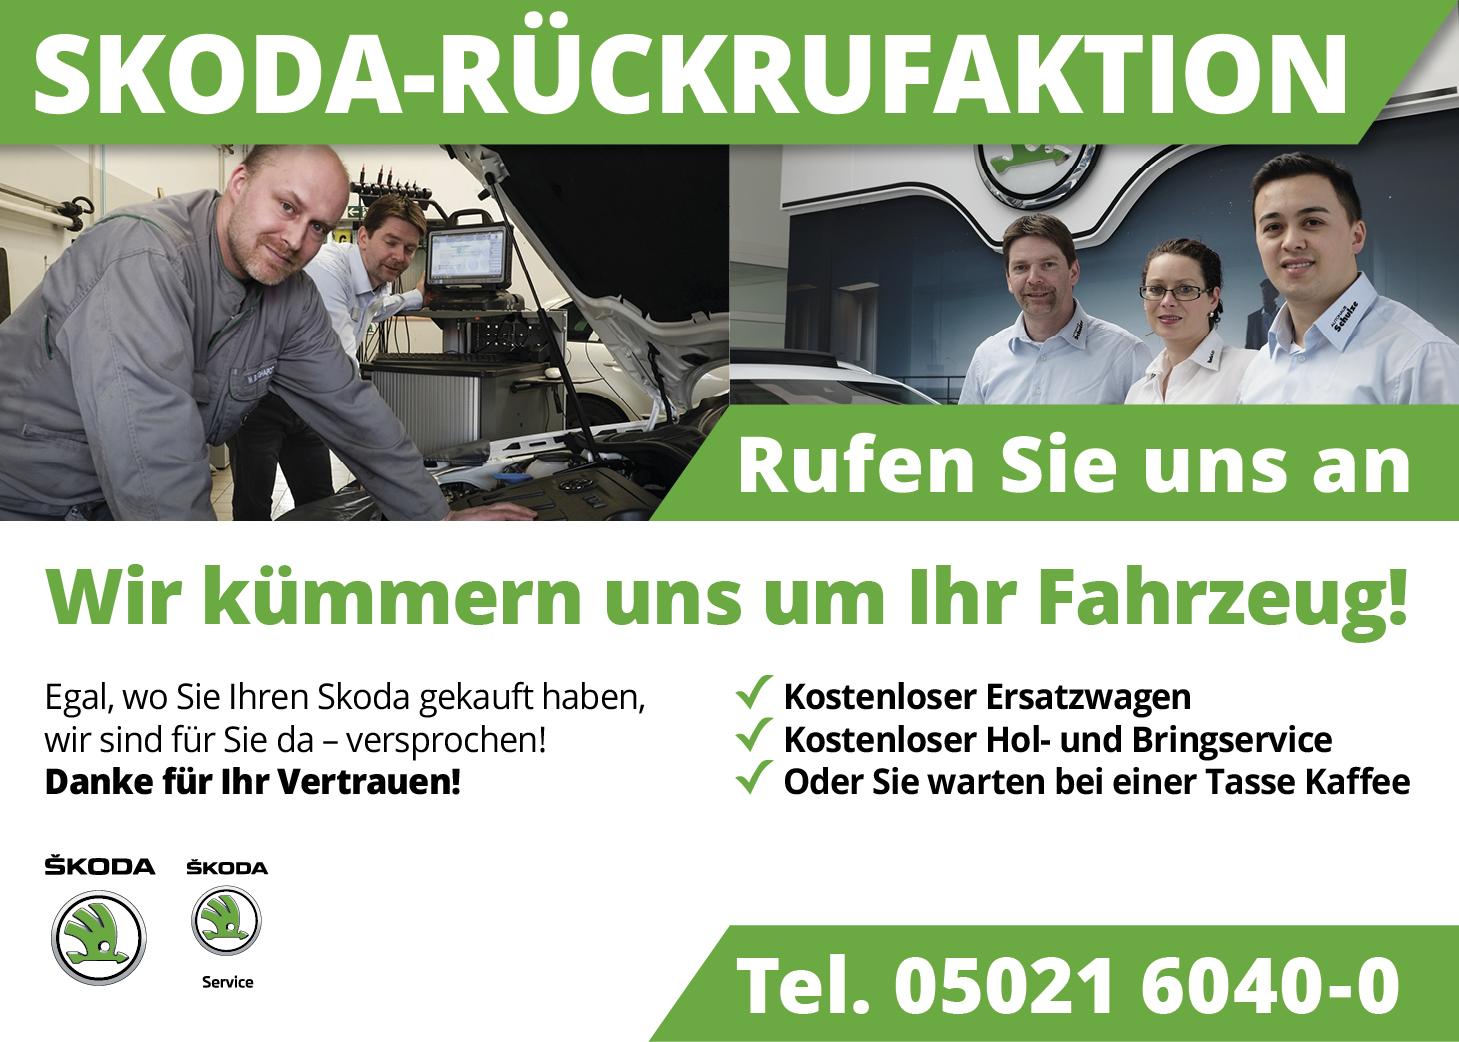 rueckruf-nienburg